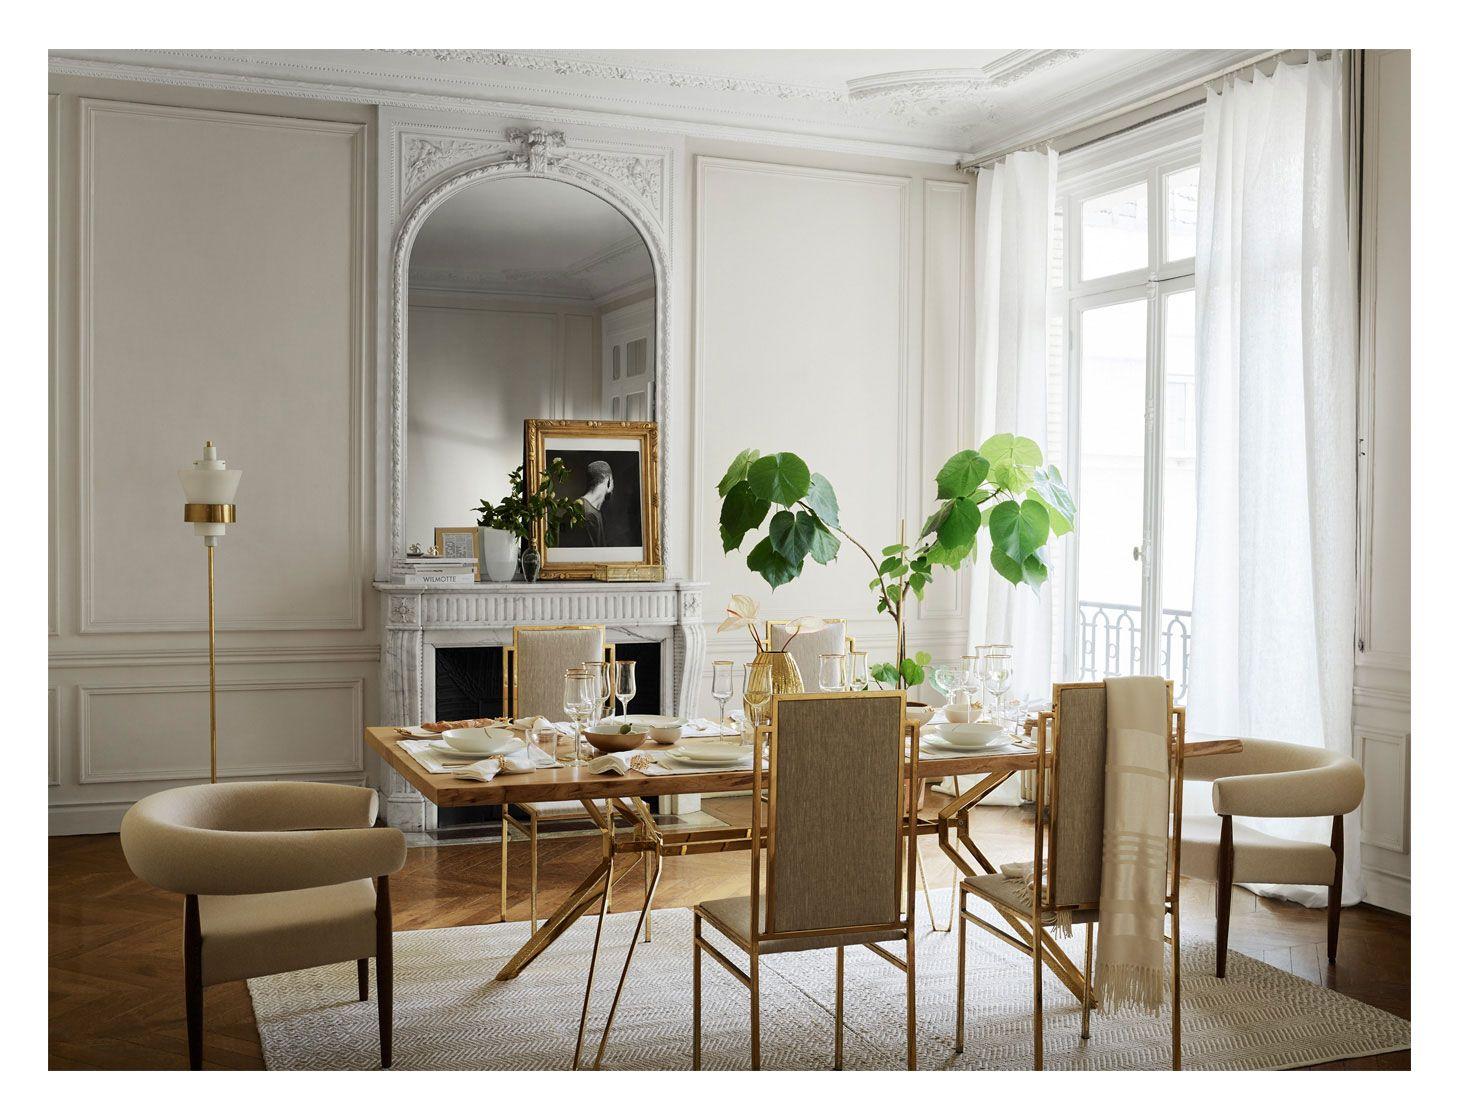 Zara-Home-OI-2016-201713